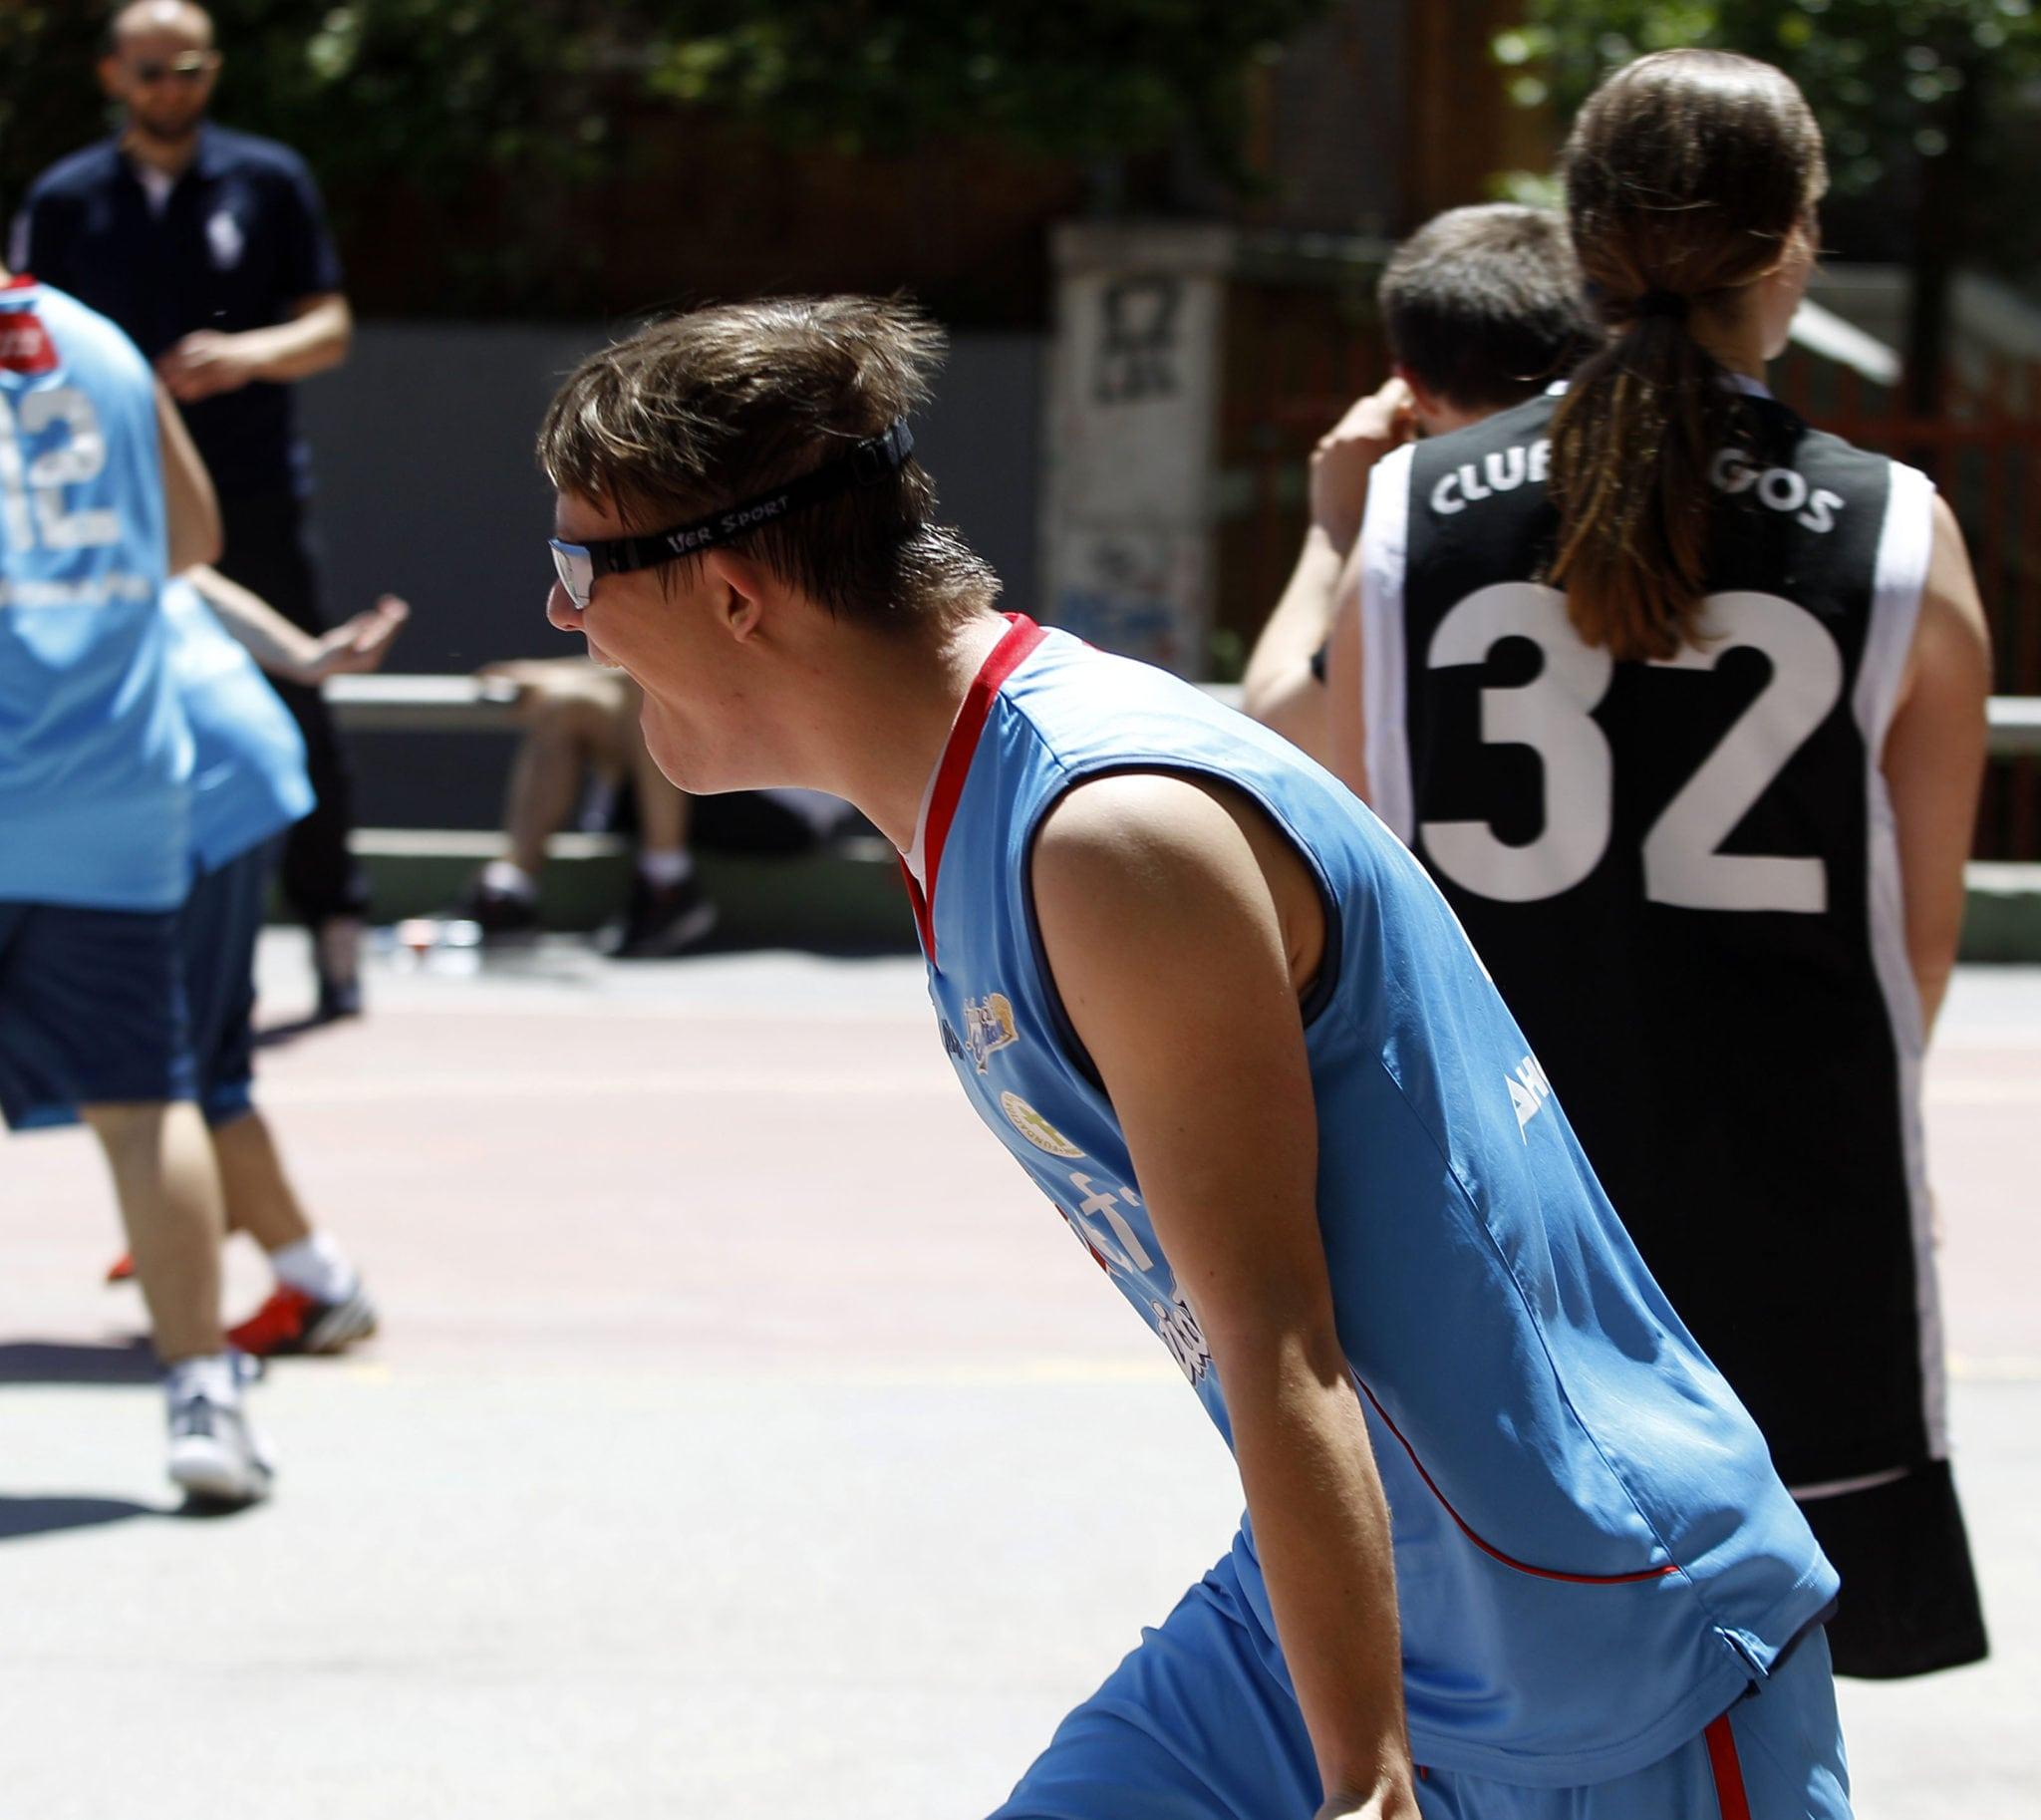 Blog de cantera: doble crónica de los derbis dobles en liga FEMADDI